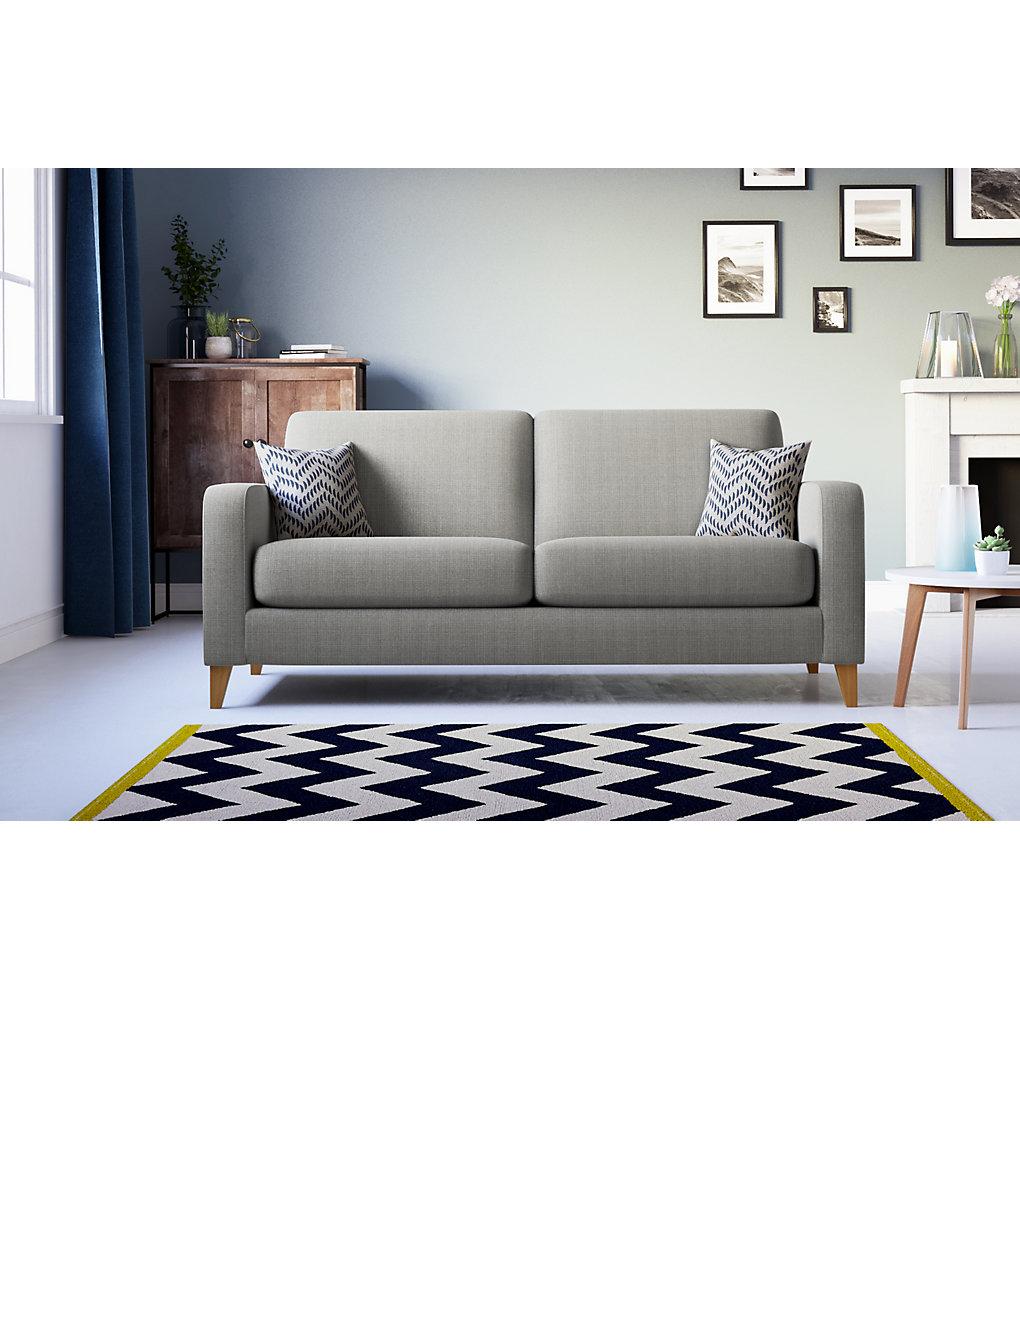 Loft Sofa Marks And Spencer Rs Gold Sofa